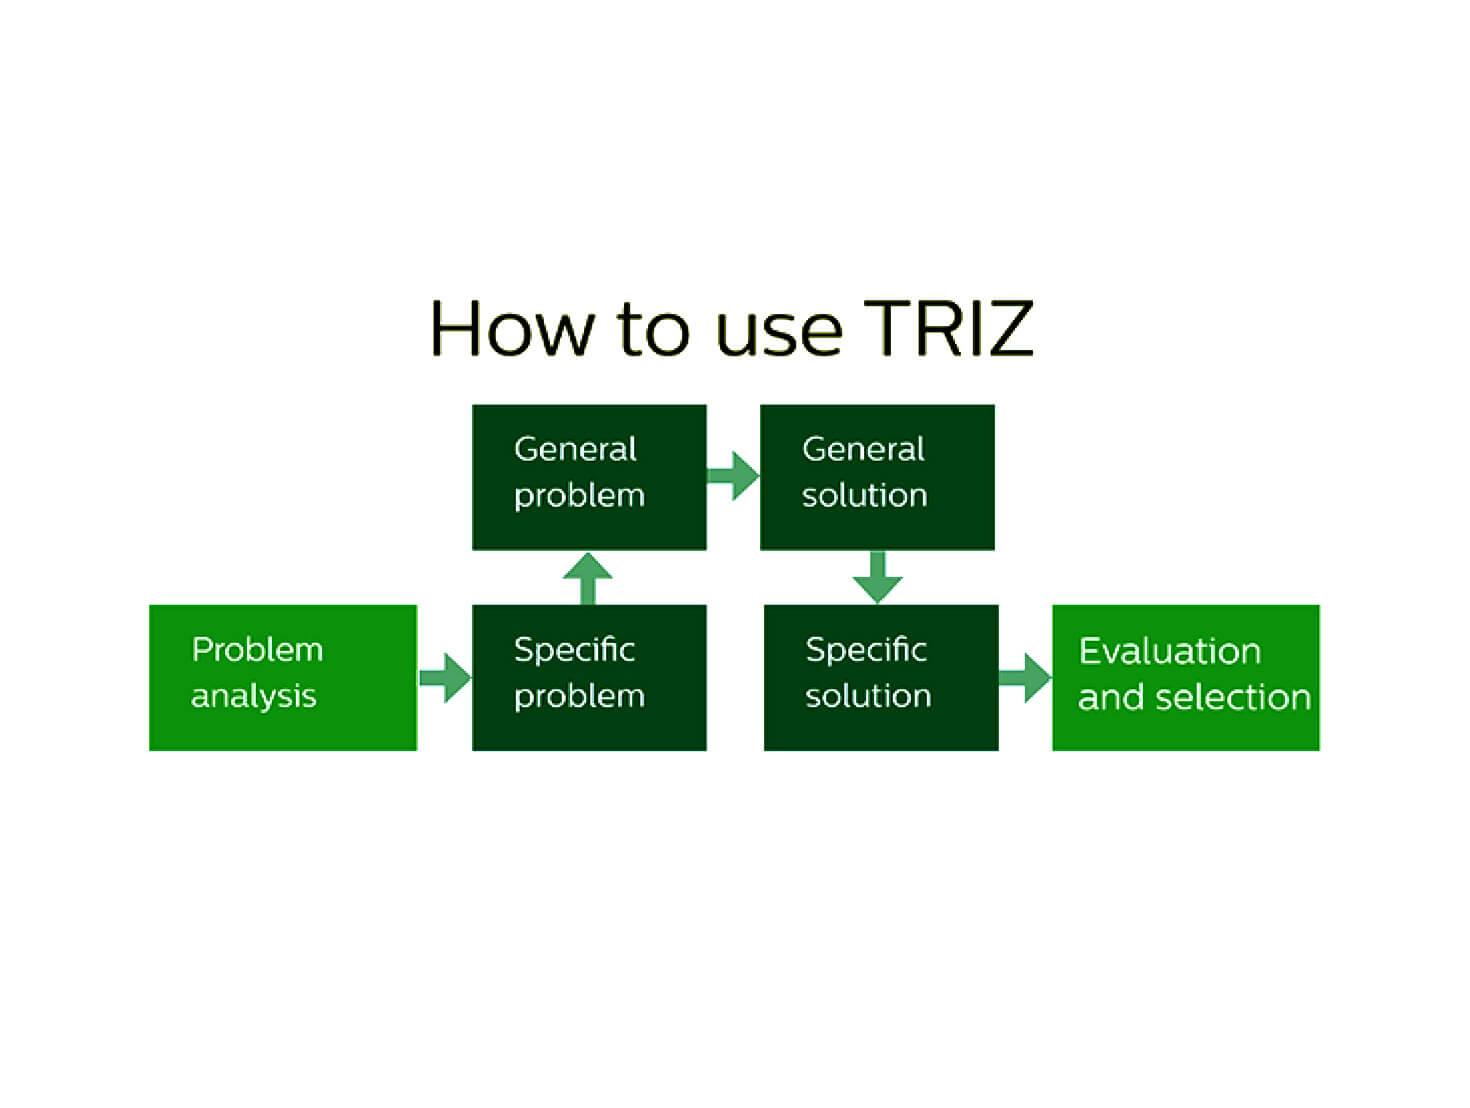 TRIZ,هم افزایی،سطوح نوآوری